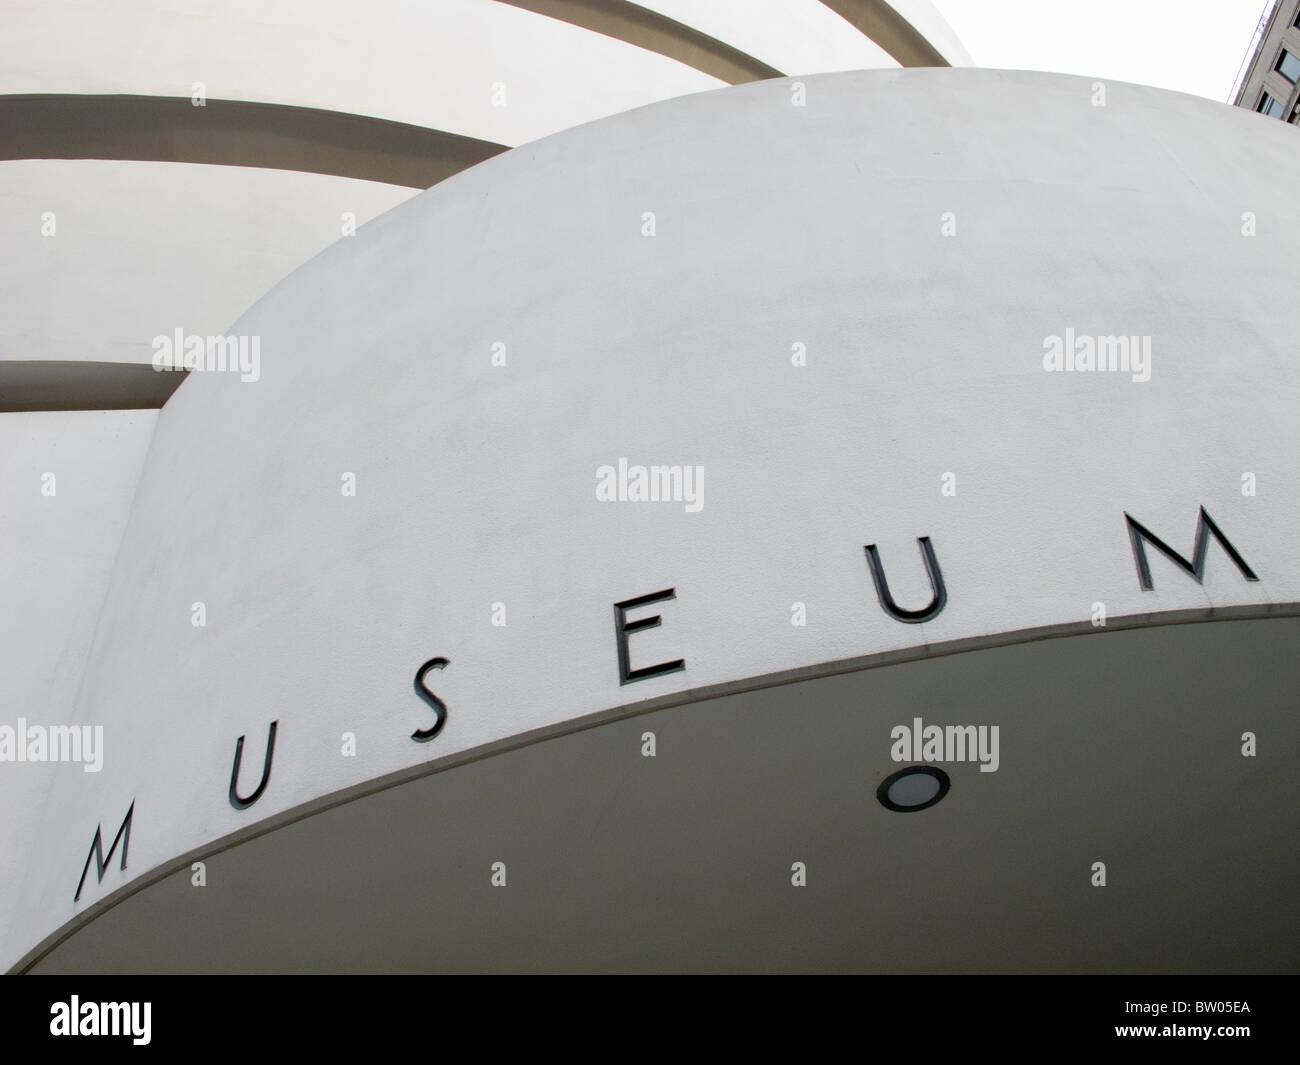 Exterior detail of of Guggenheim Museum in Manhattan New York City USA - Stock Image